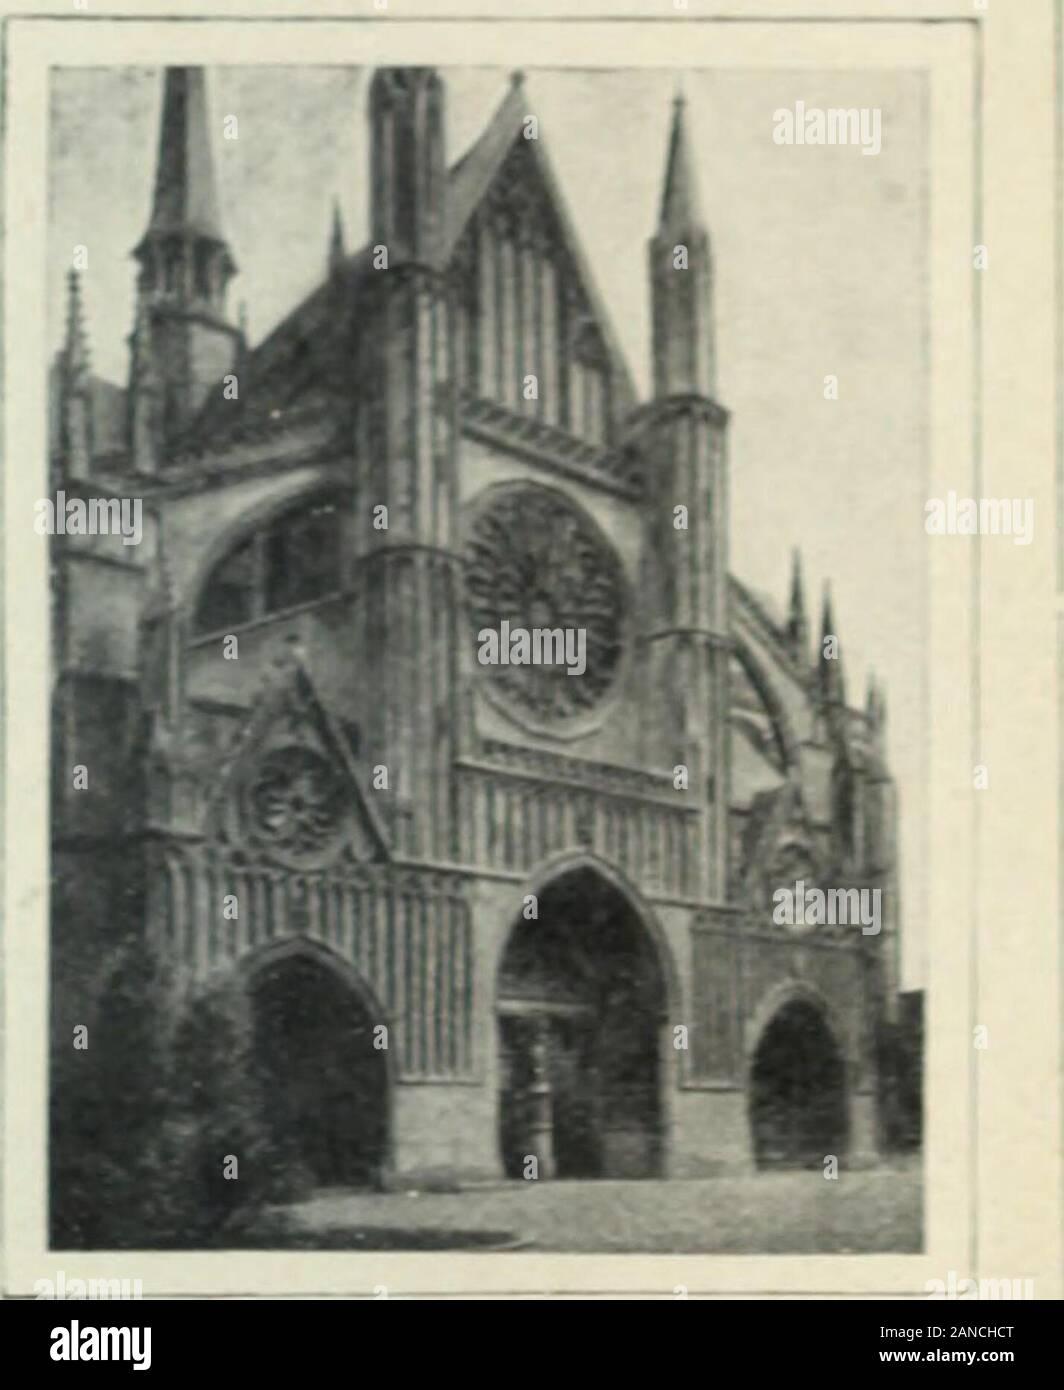 Portail Des Flandres Salome maigre stock photos & maigre stock images - alamy